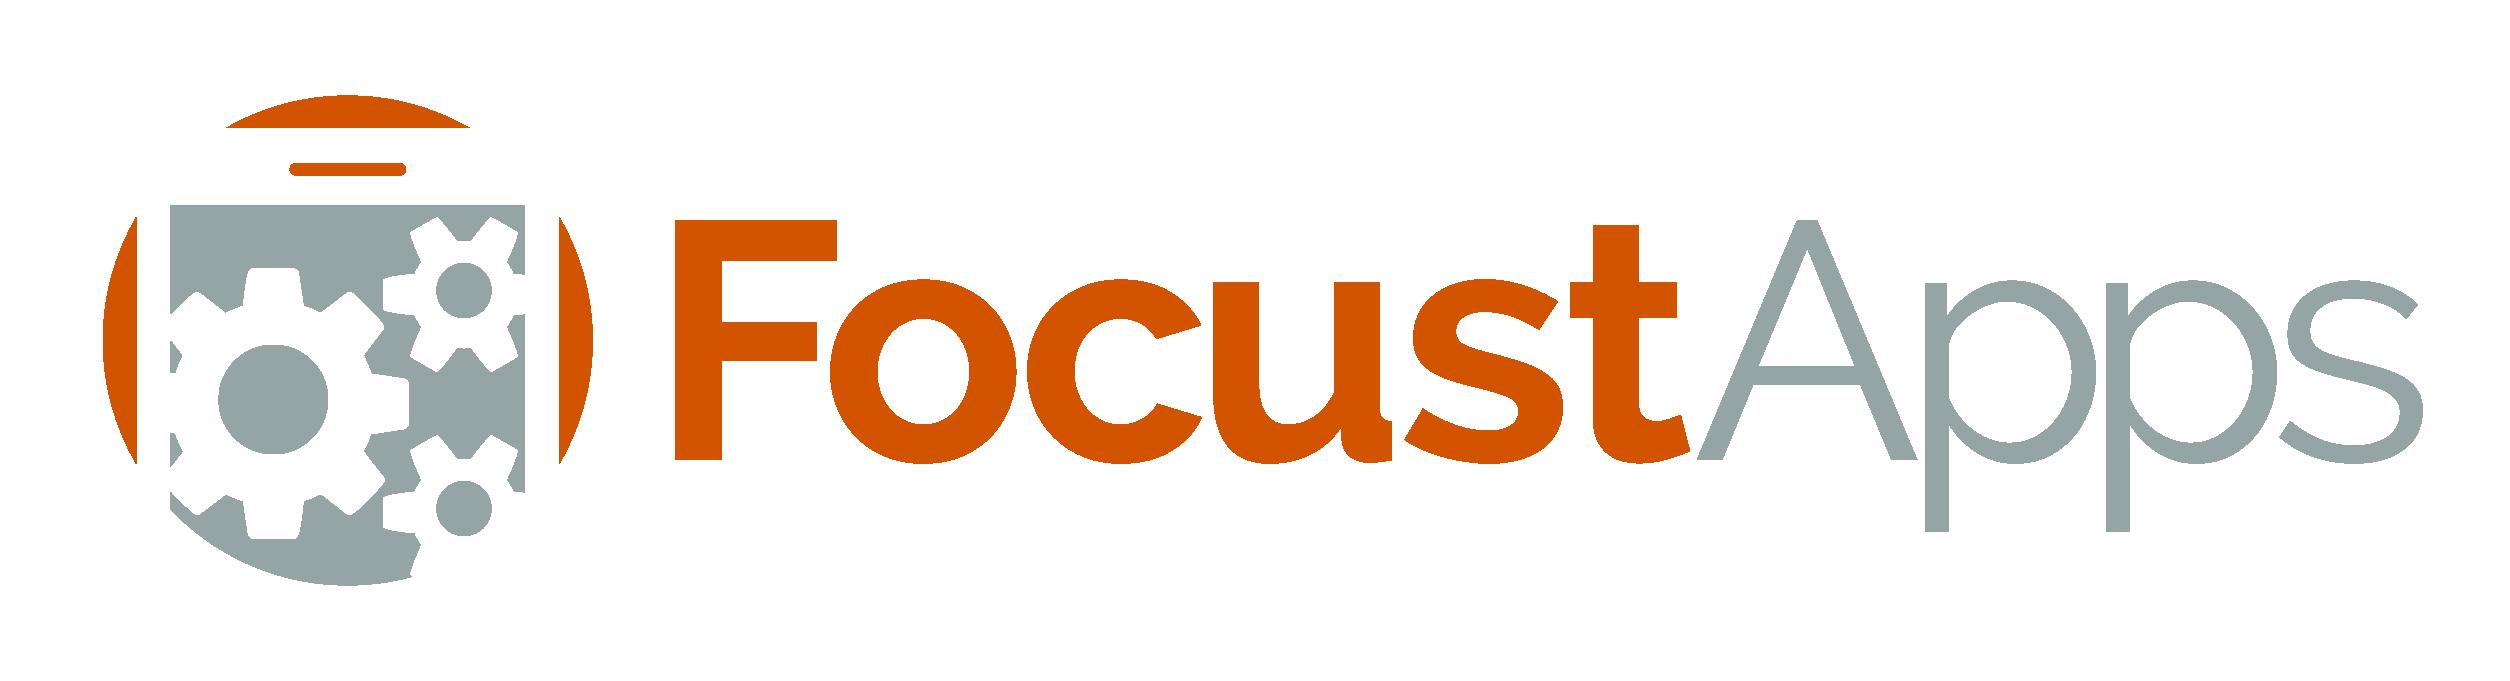 FocustApps